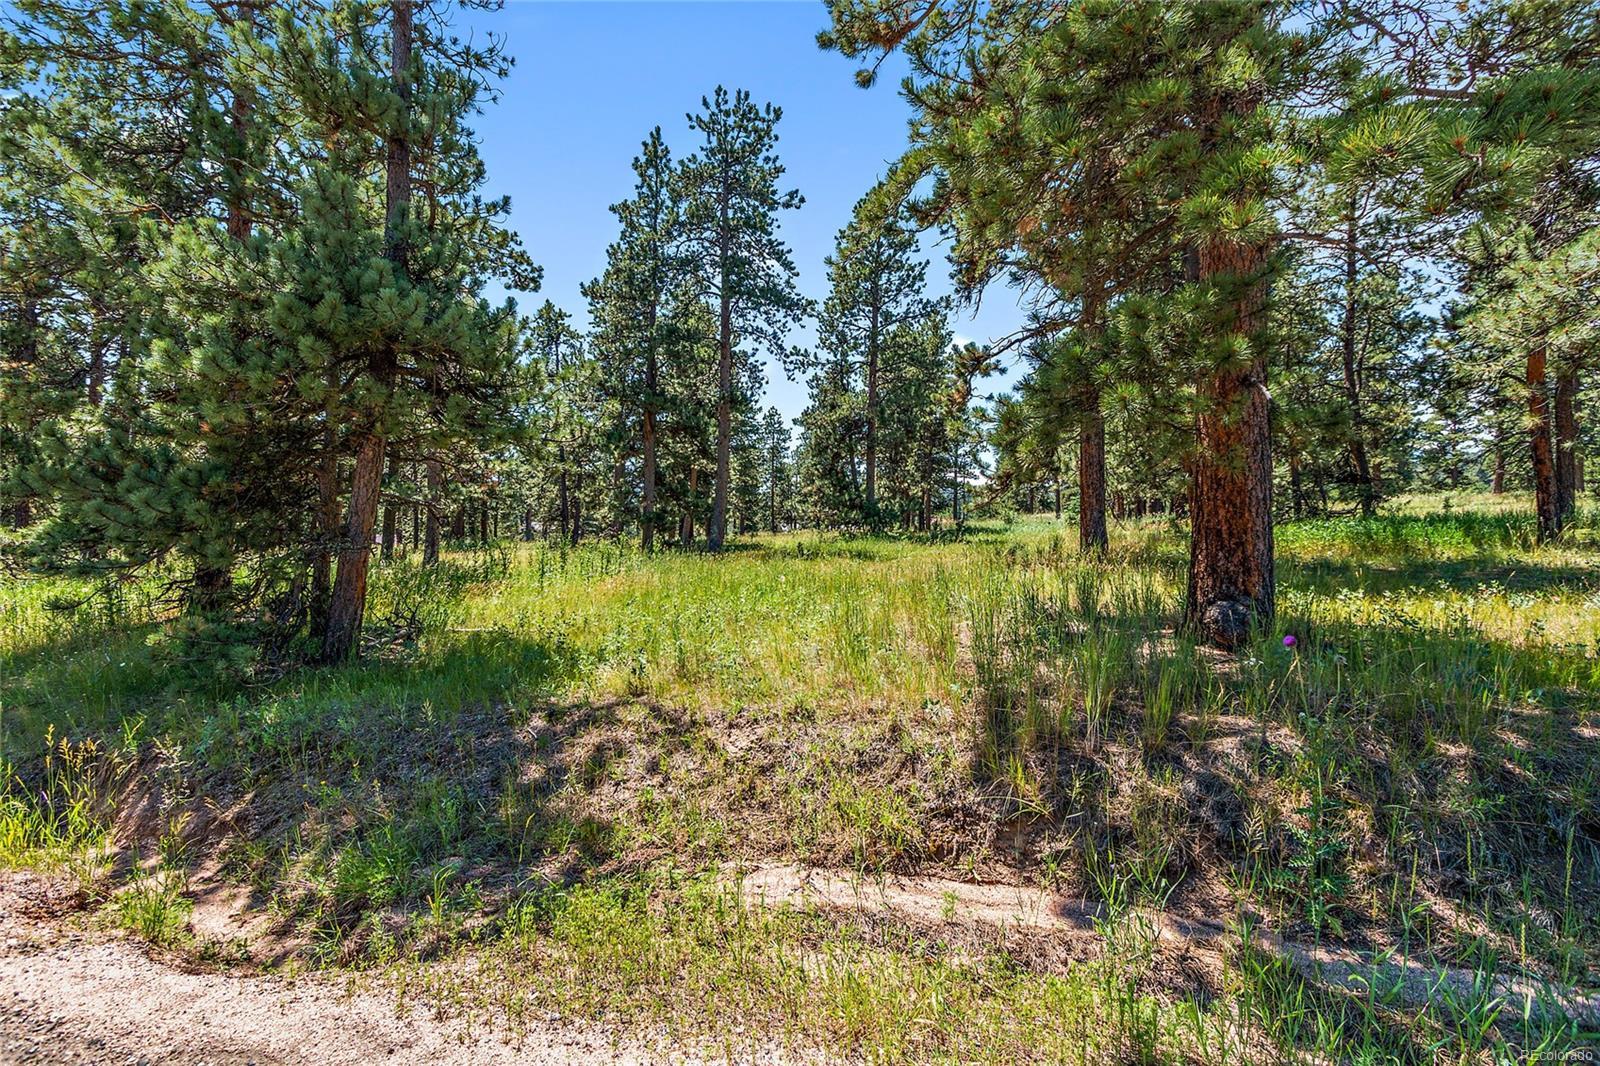 8177 Centaur Drive, Evergreen, CO 80439 - Evergreen, CO real estate listing